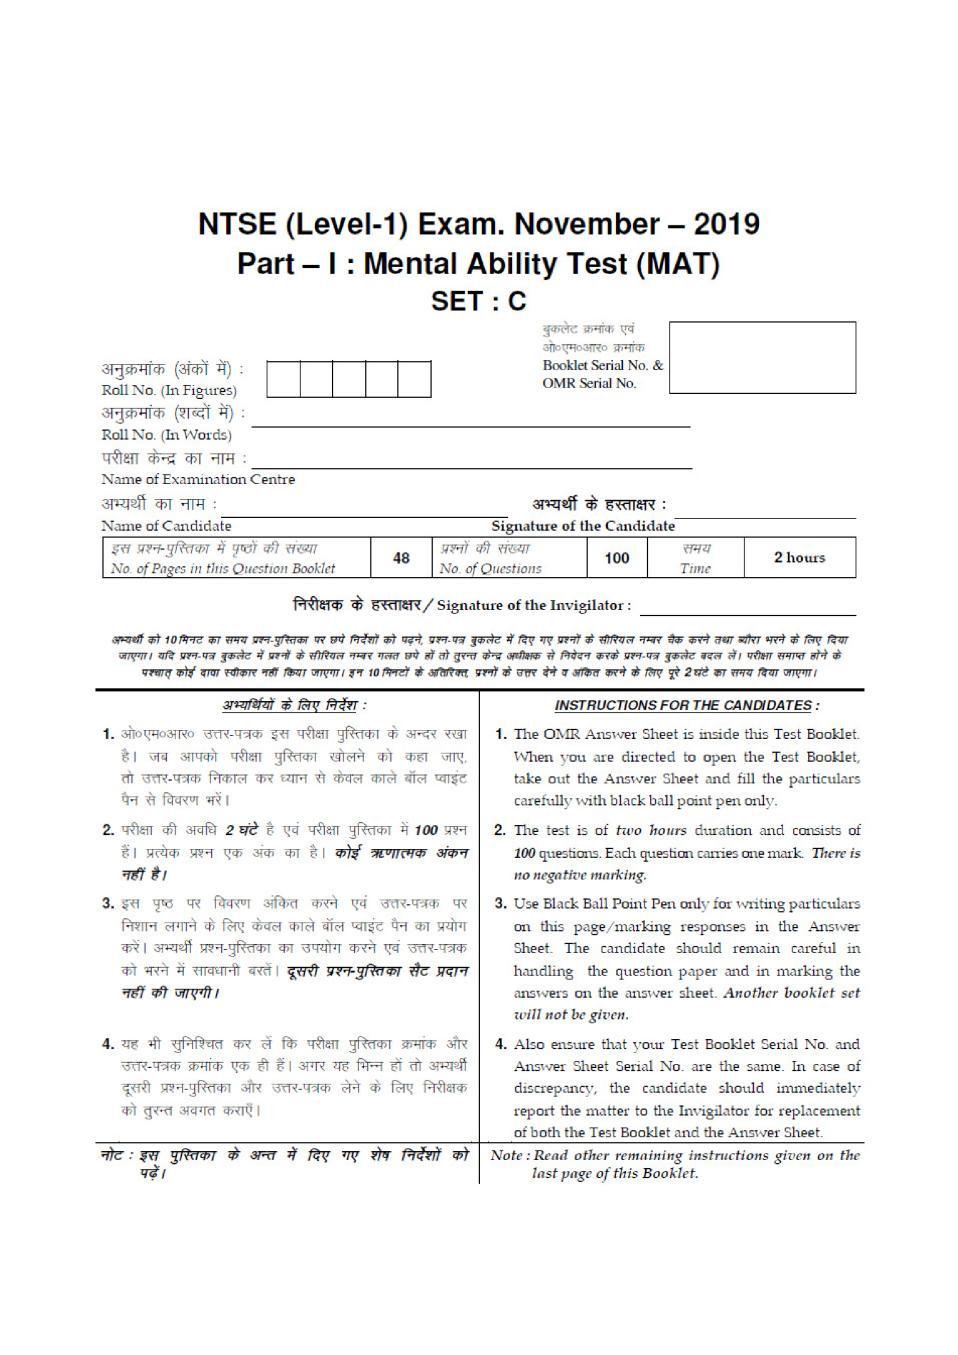 Haryana NTSE Nov 2019 MAT Question Paper Set C - Page 1